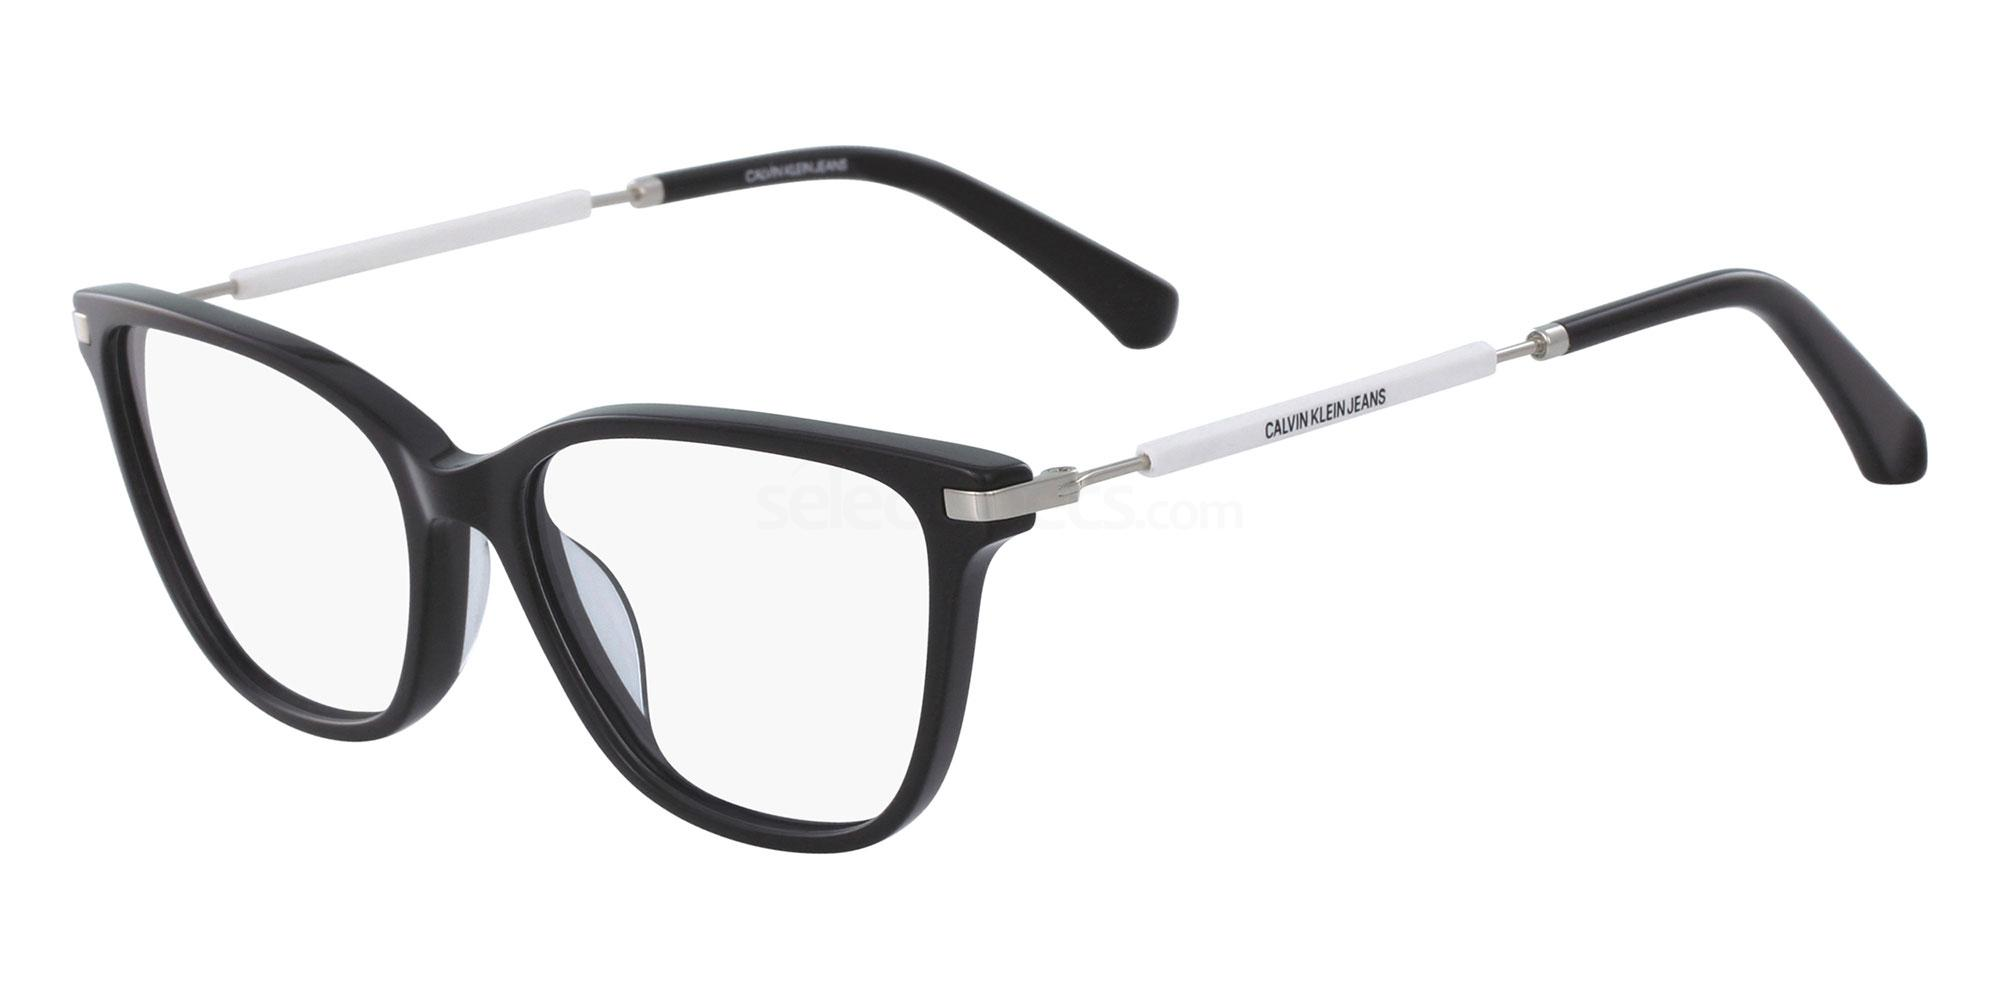 001 CKJ18703 Glasses, Calvin Klein Jeans